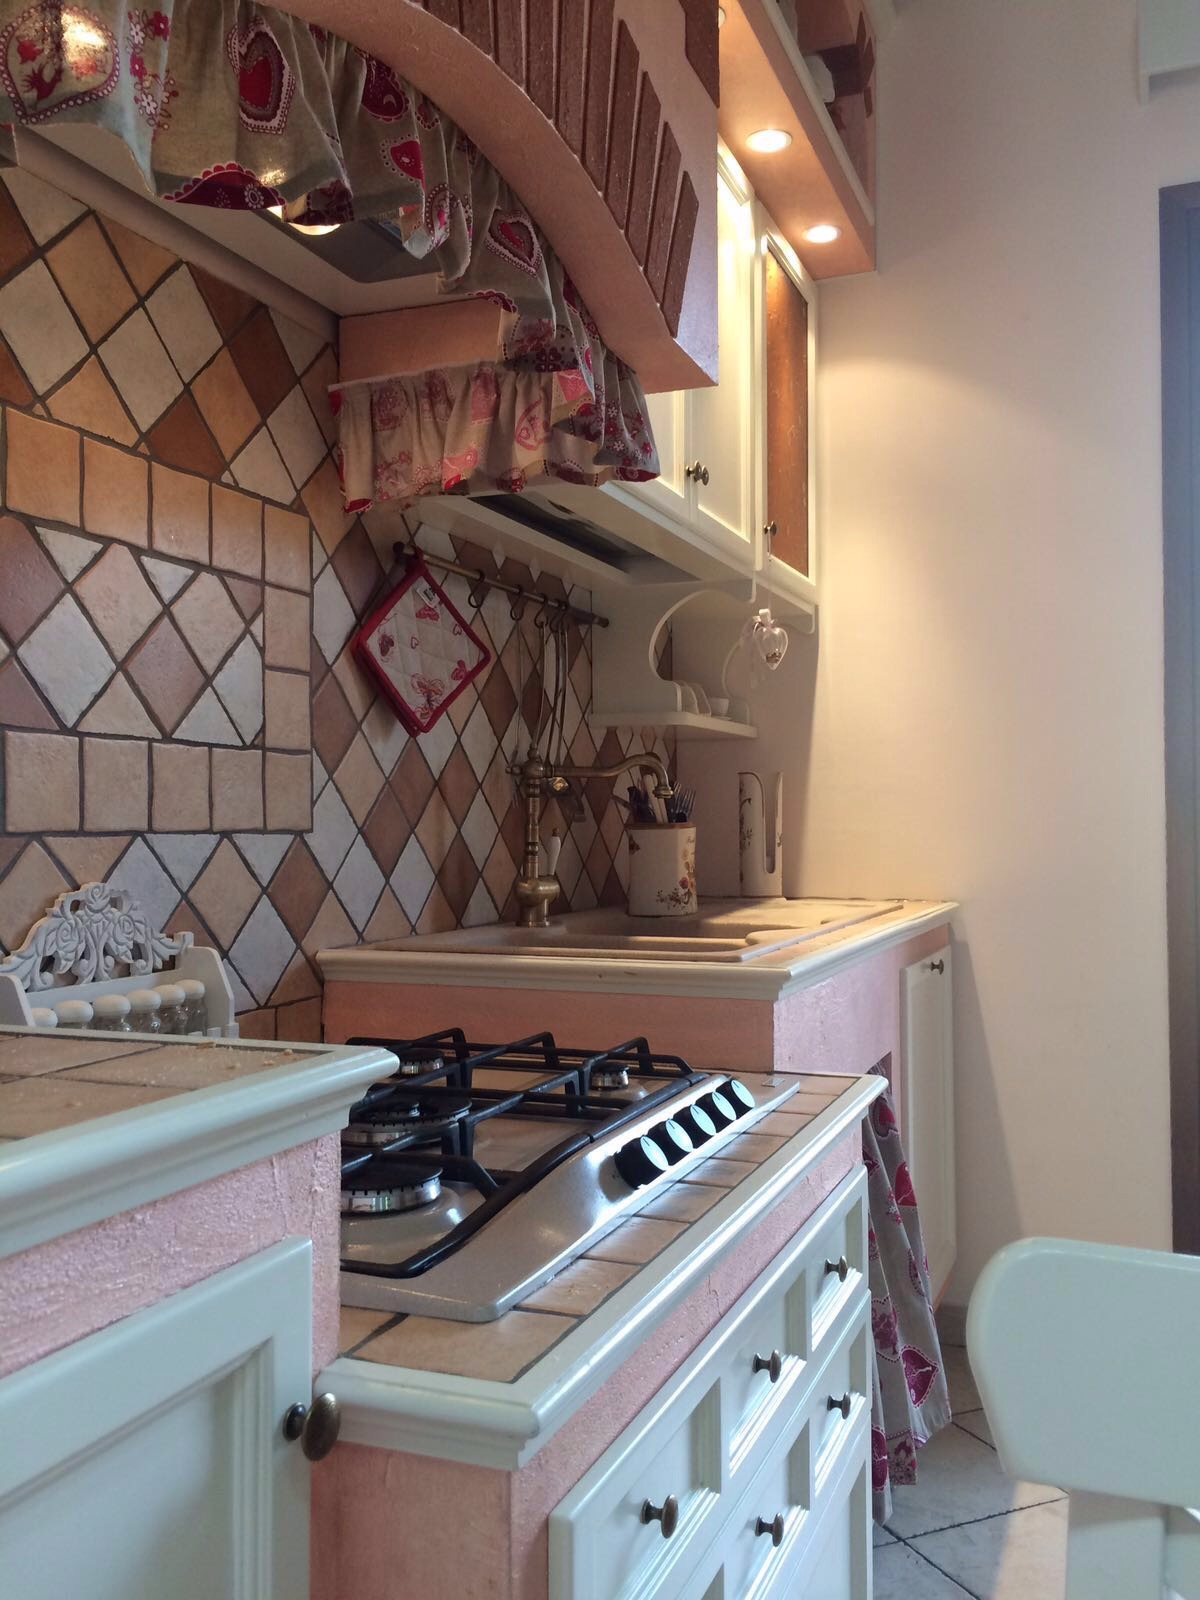 Cucina artigianale in muratura rosa e pietra cotta | Basile